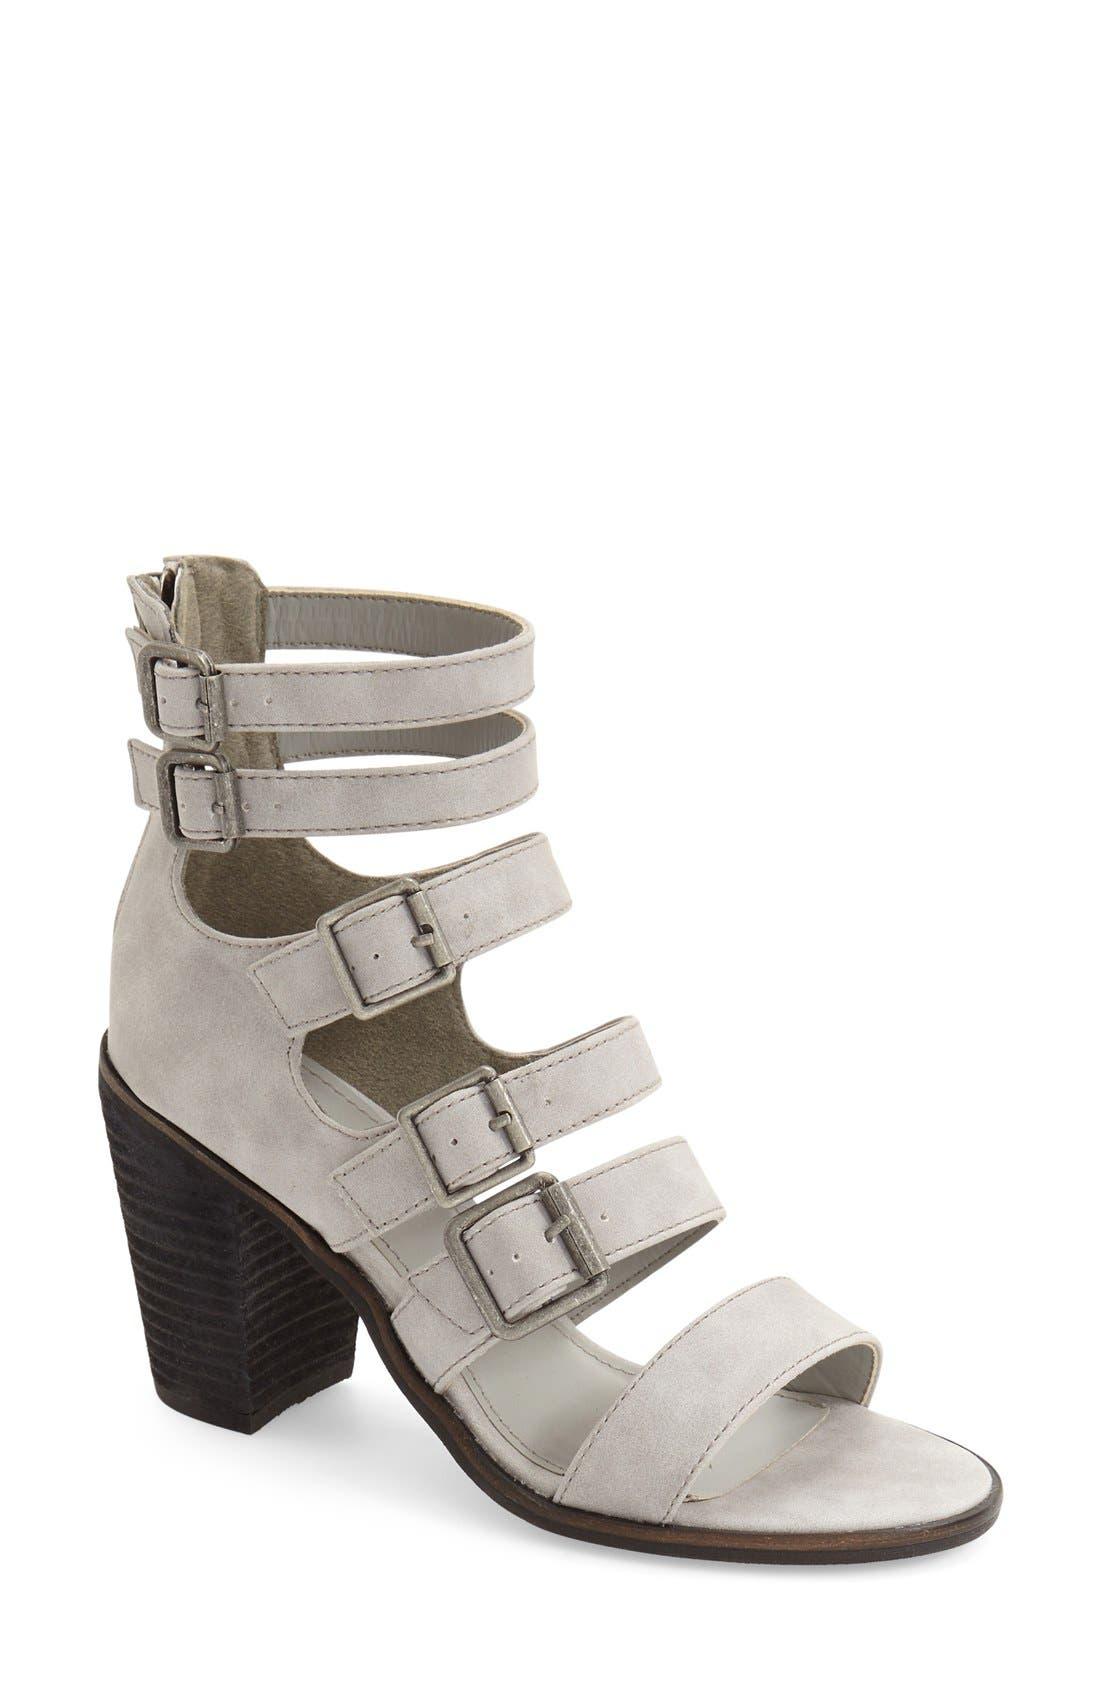 Main Image - Rebels 'Yandy' Strappy Block Heel Sandal (Women)